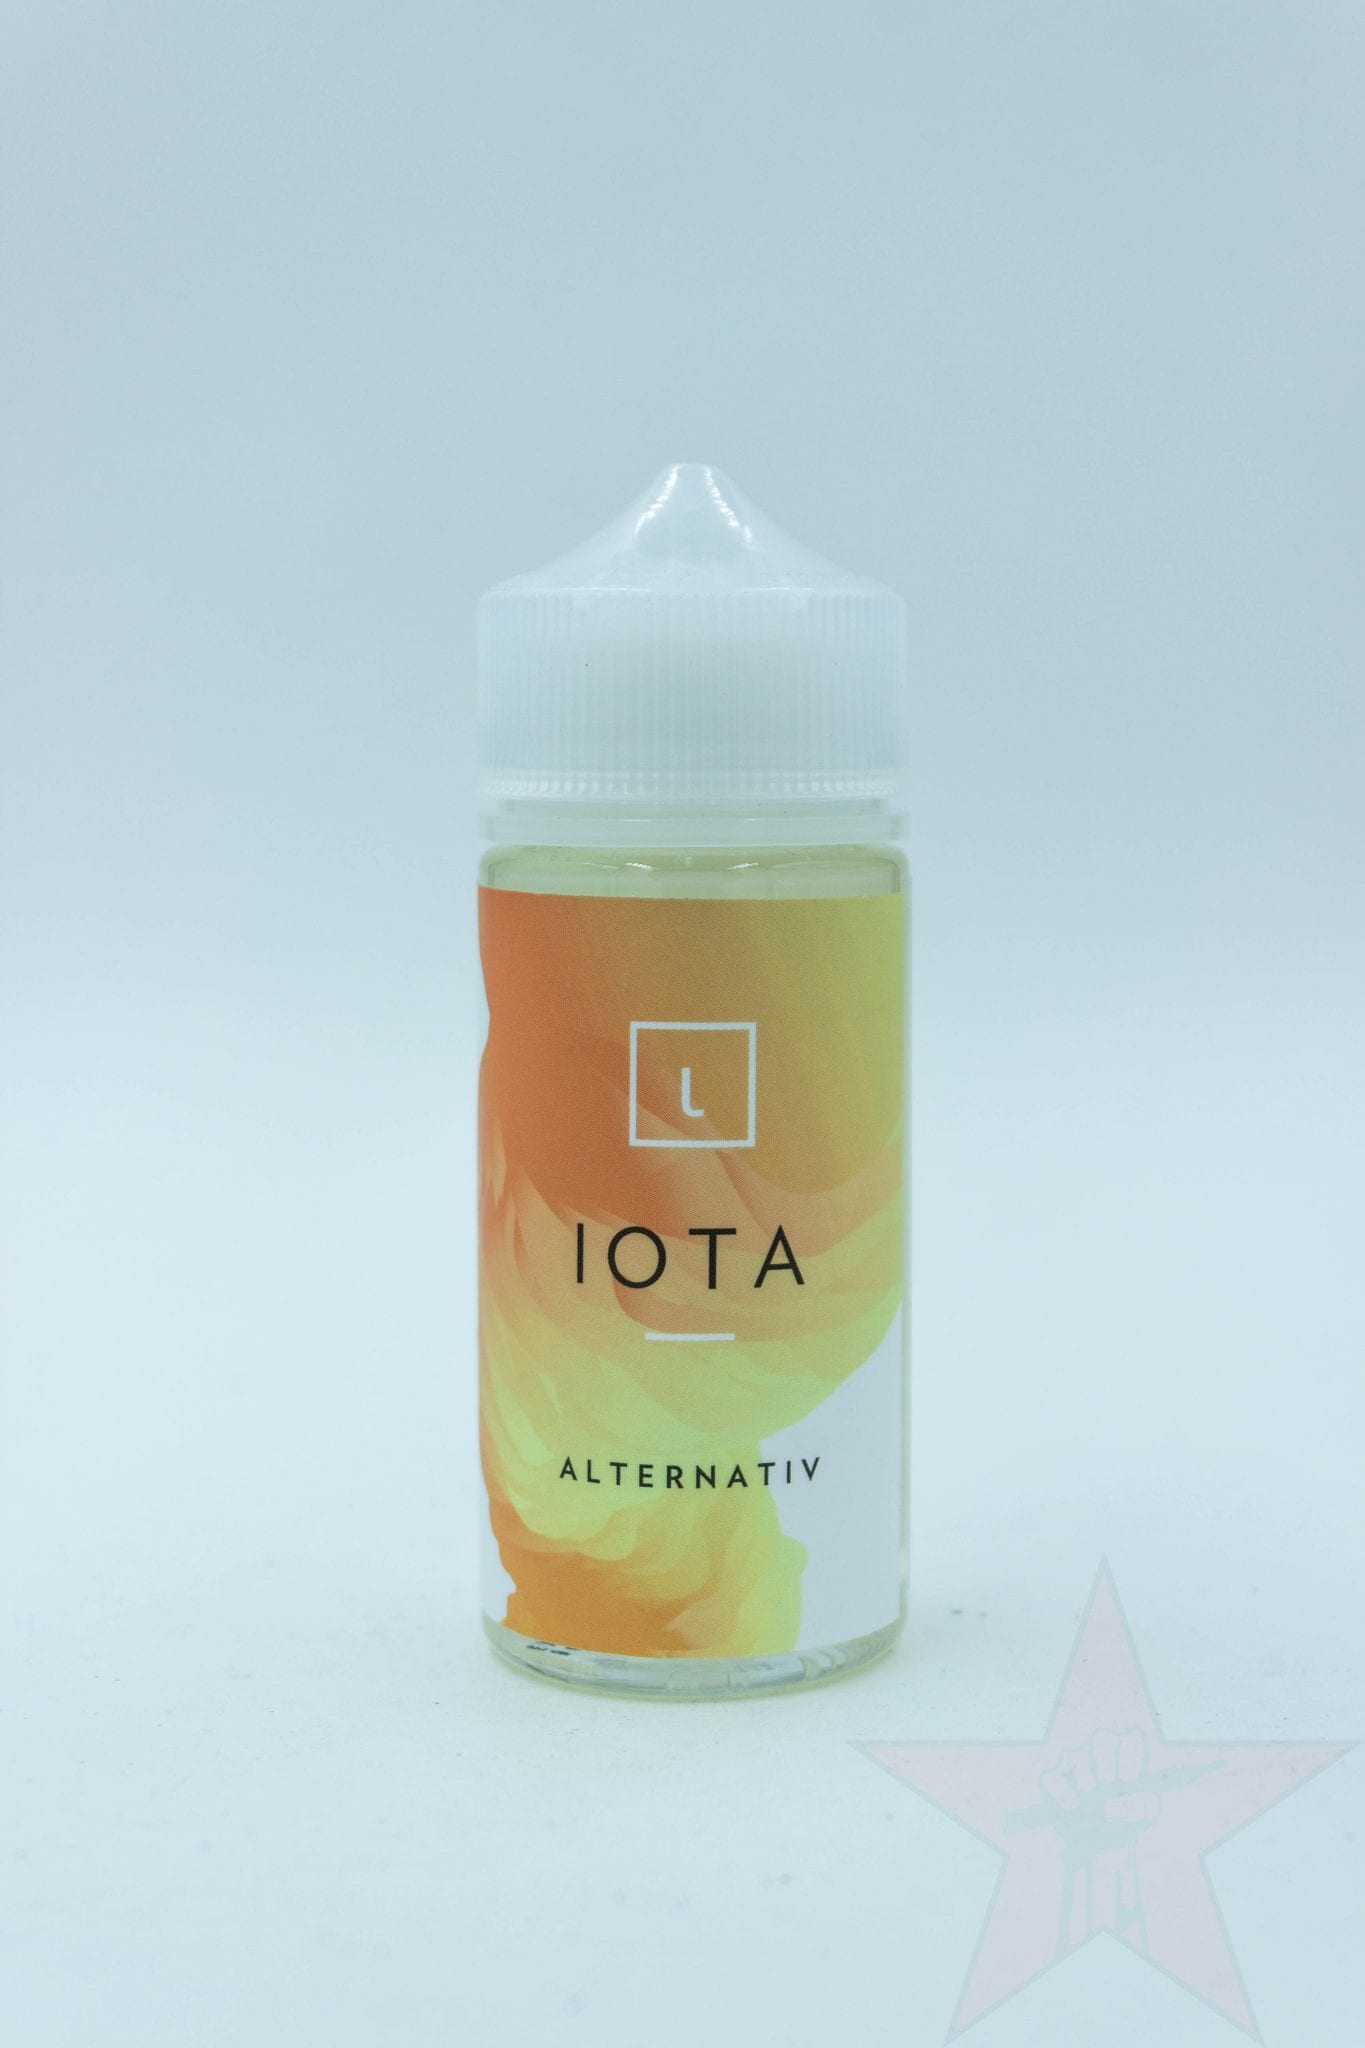 Alternativ - Iota - 100mL